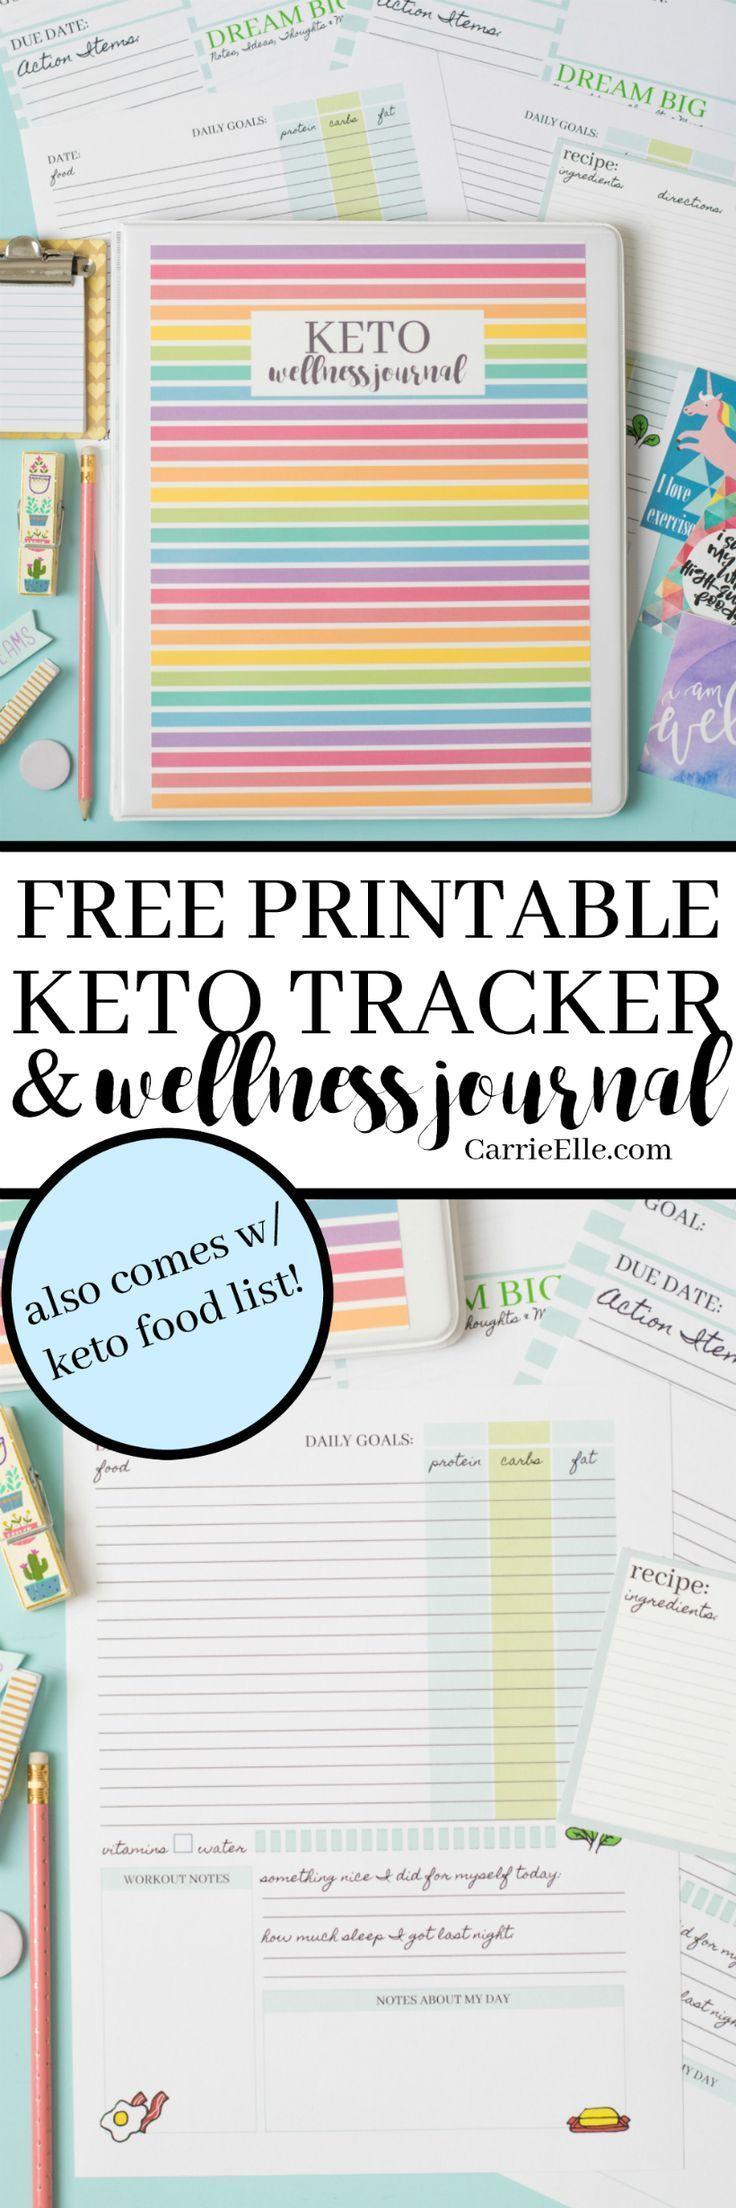 Printable Keto Tracker & Food List Food lists, Keto